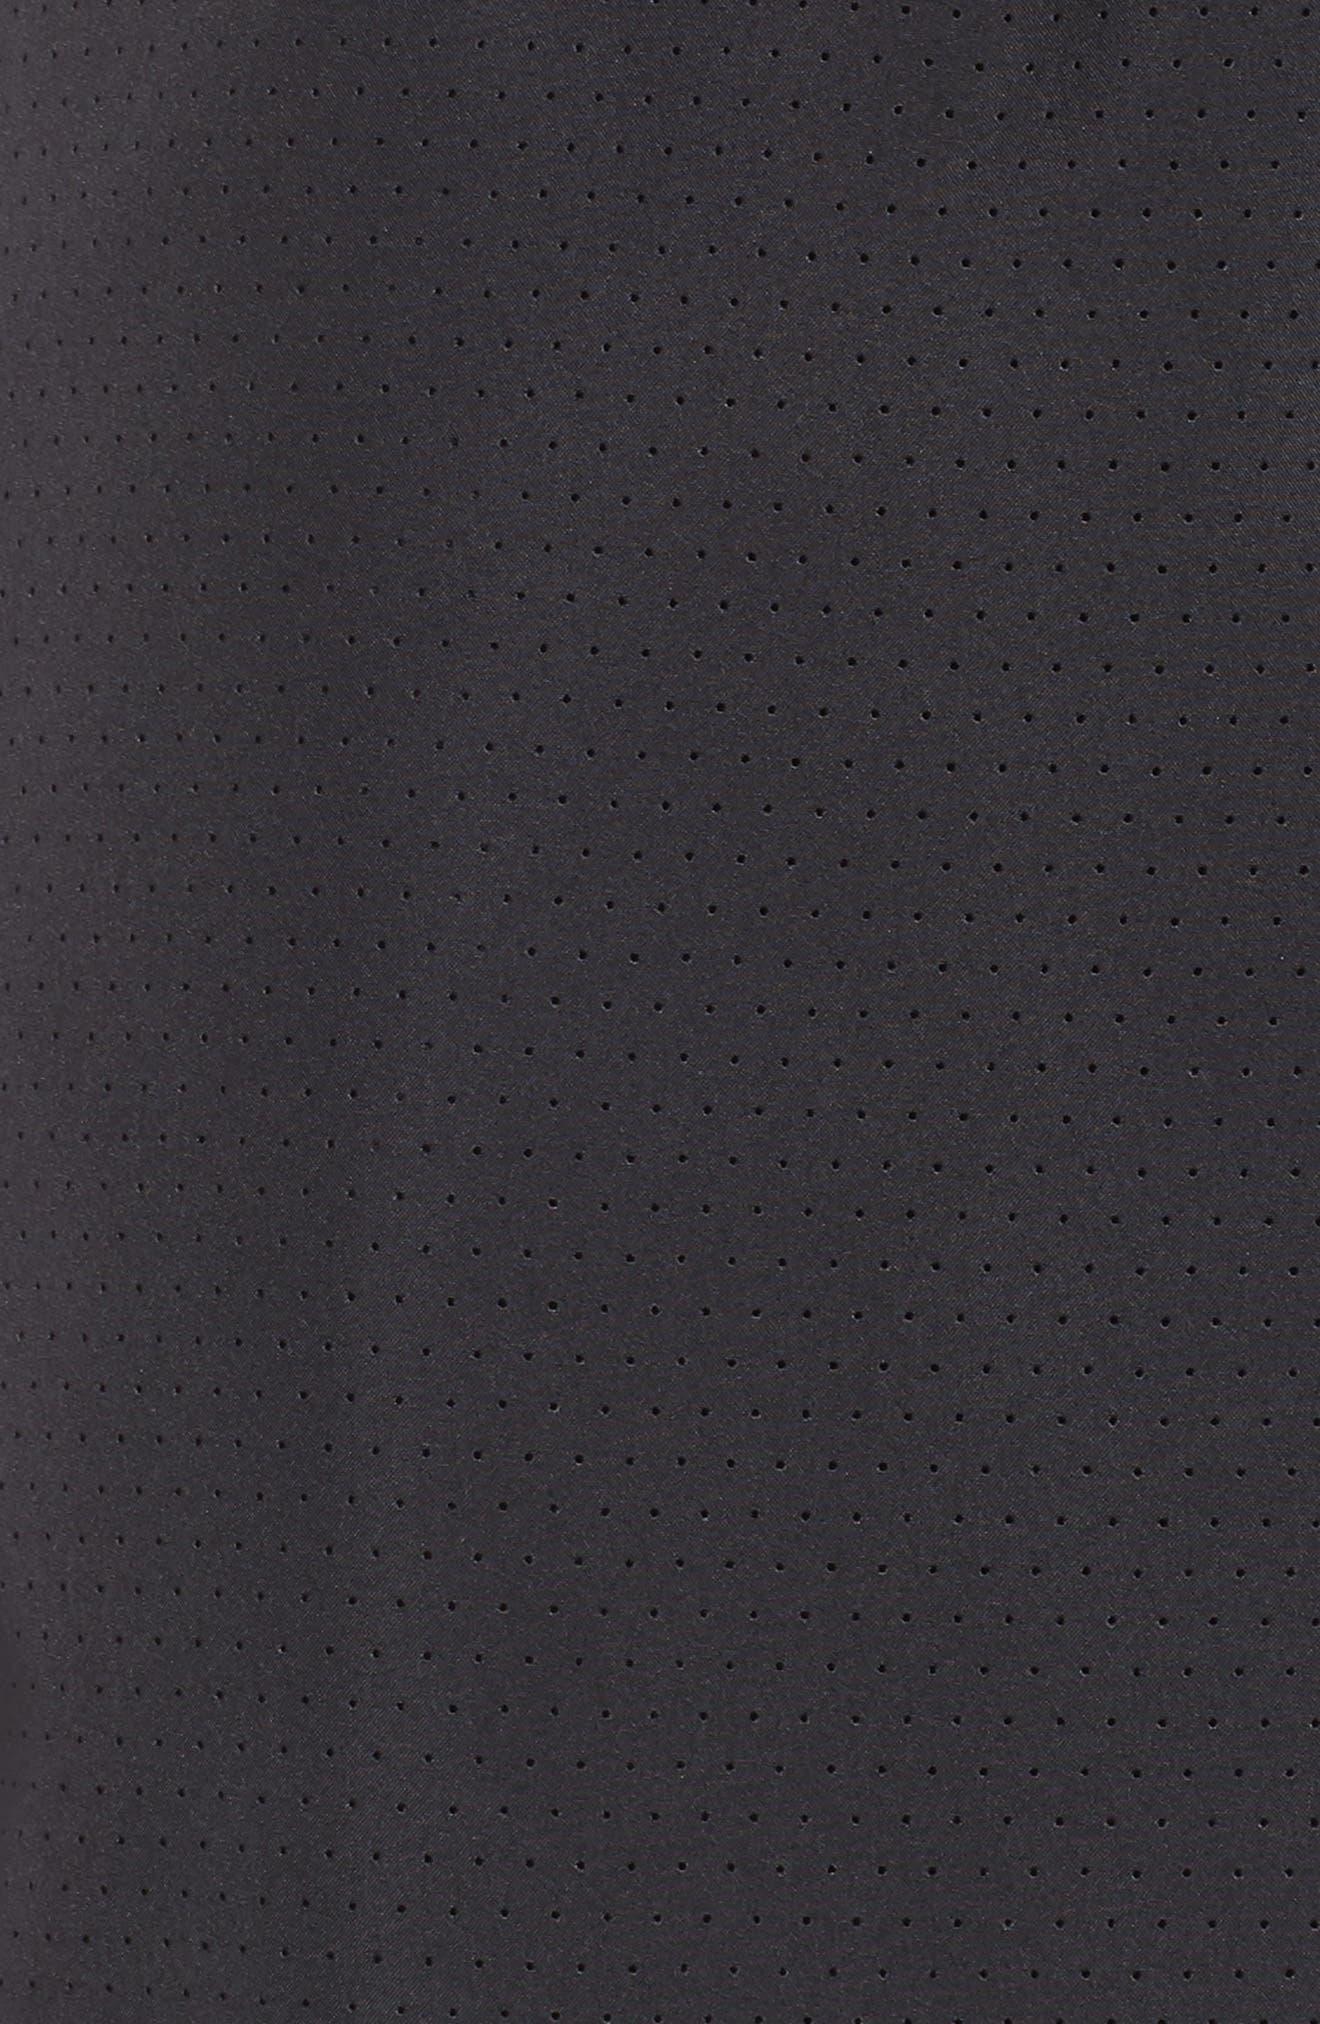 Running Challenger 2-in-1 Shorts,                             Alternate thumbnail 4, color,                             BLACK/ BLACK